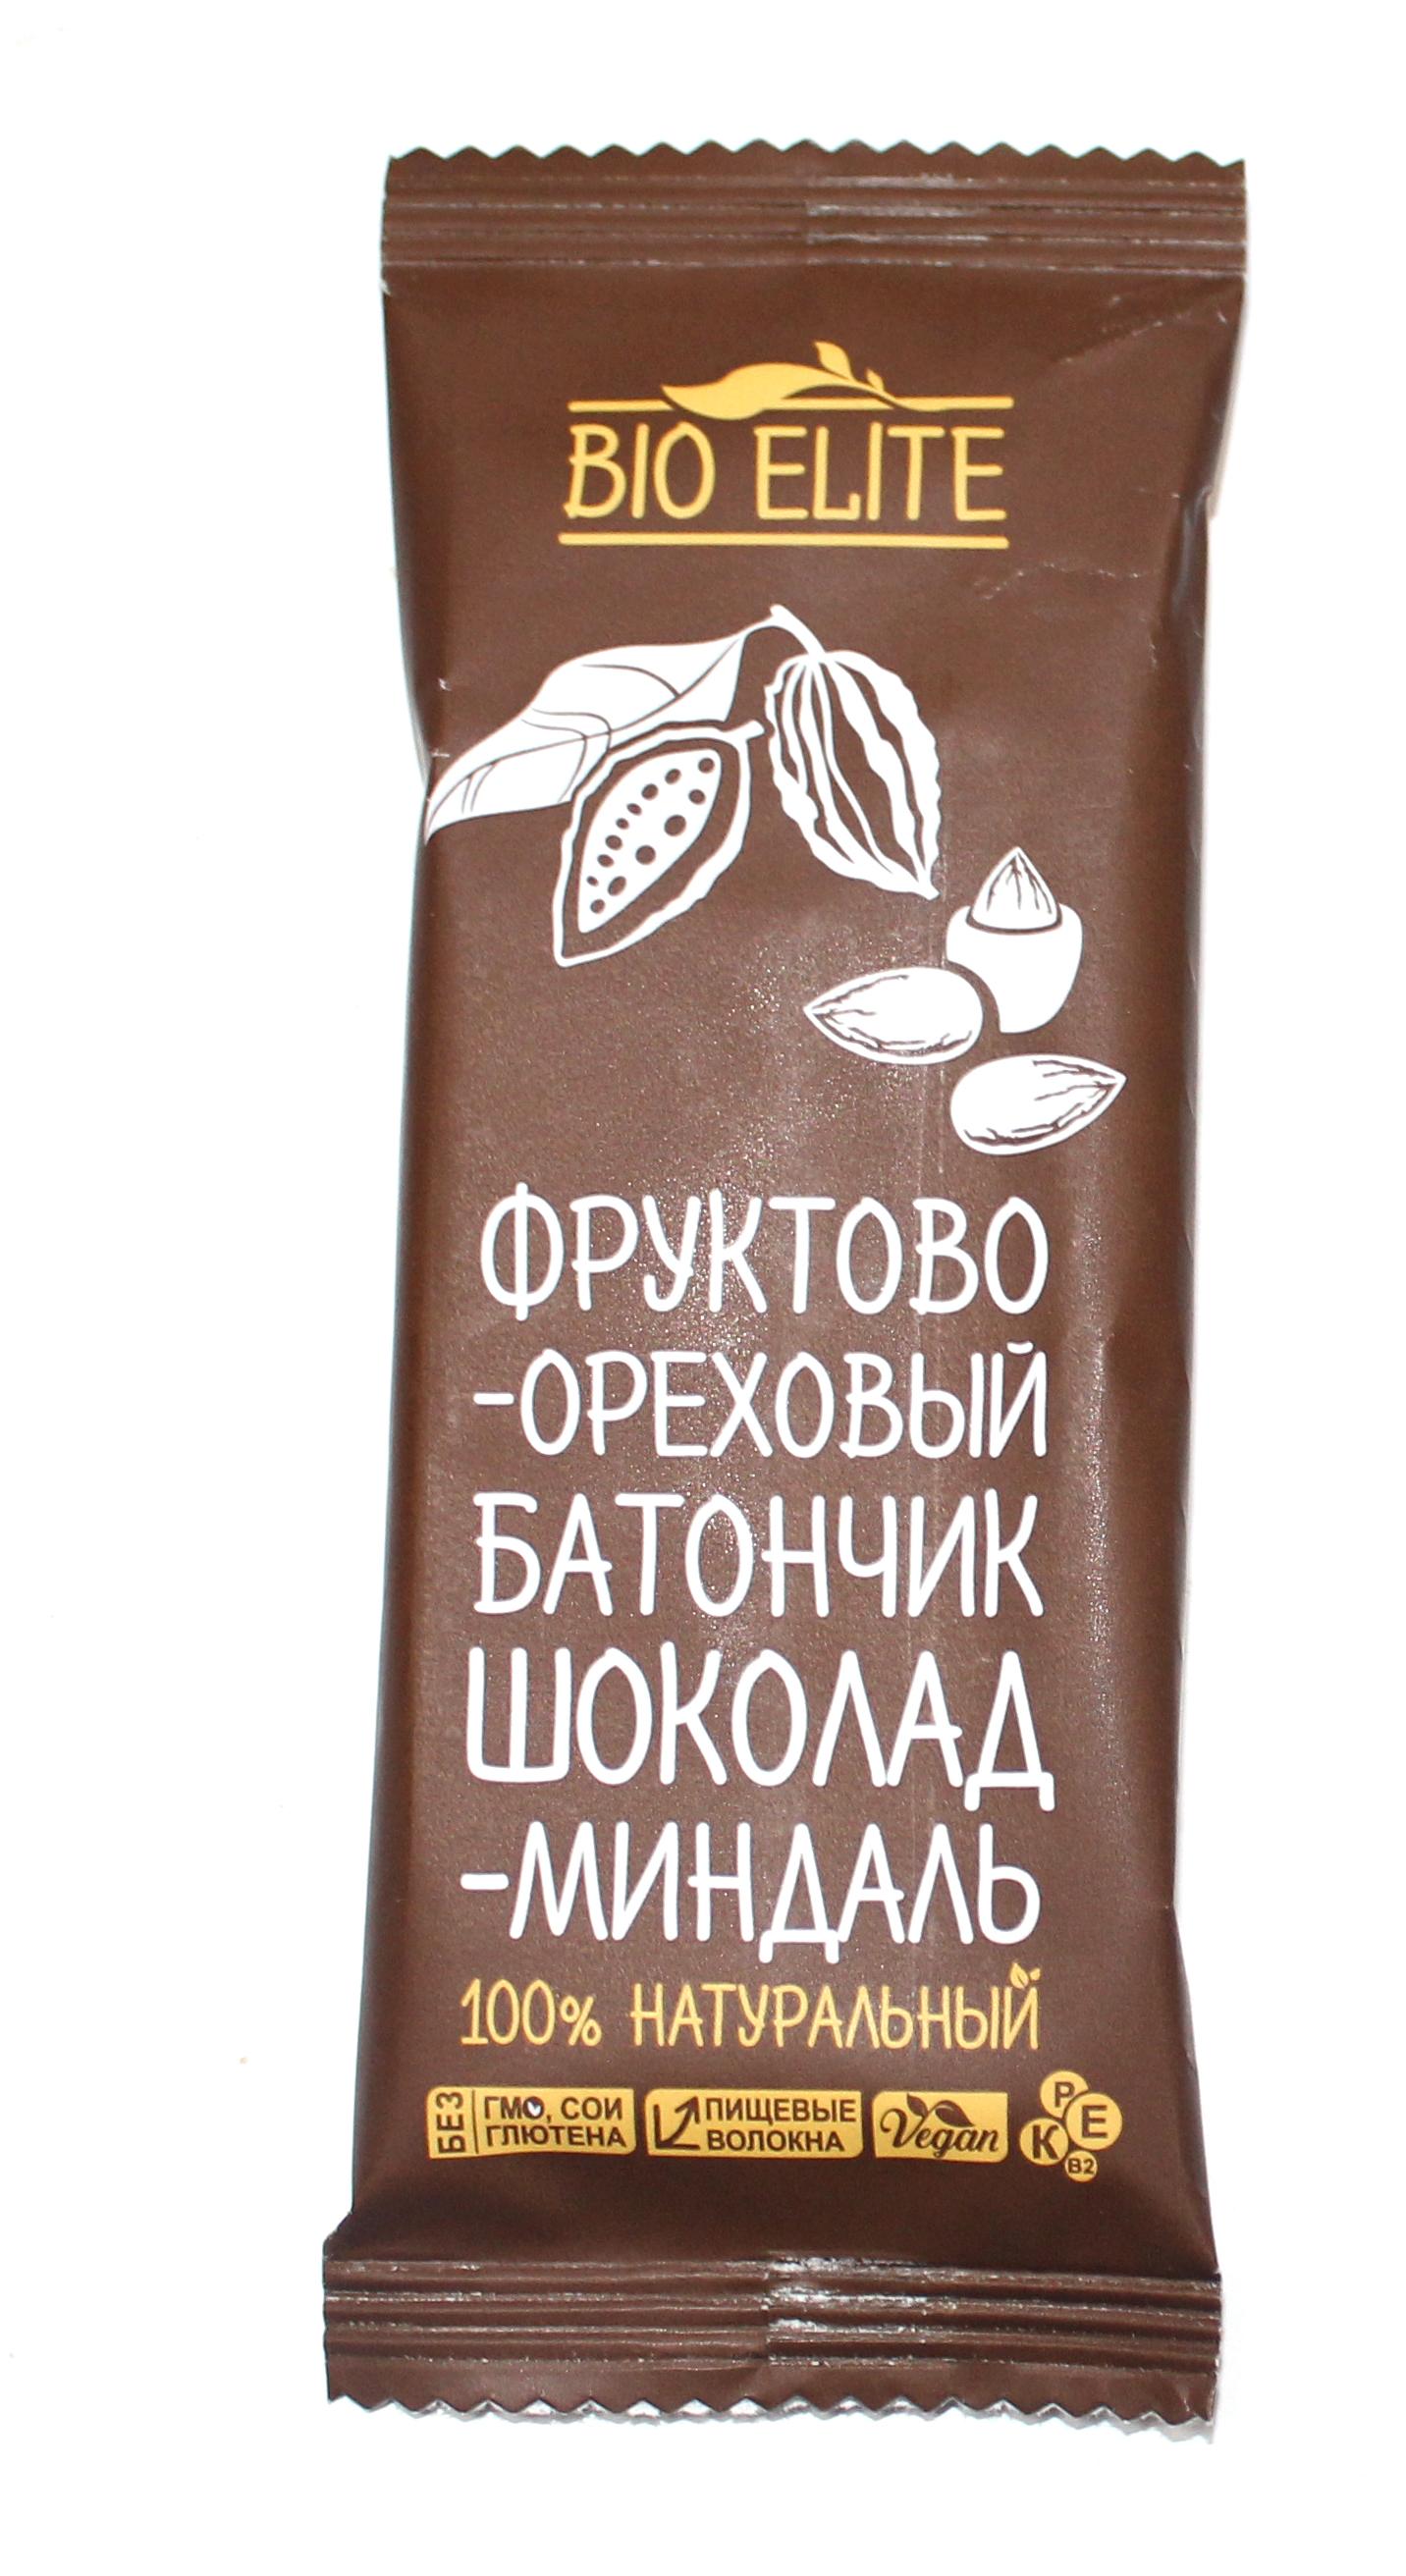 BIO ELITE - БАТОНЧИК ШОКОЛАД/МИНДАЛЬ 35гр 4870220420027